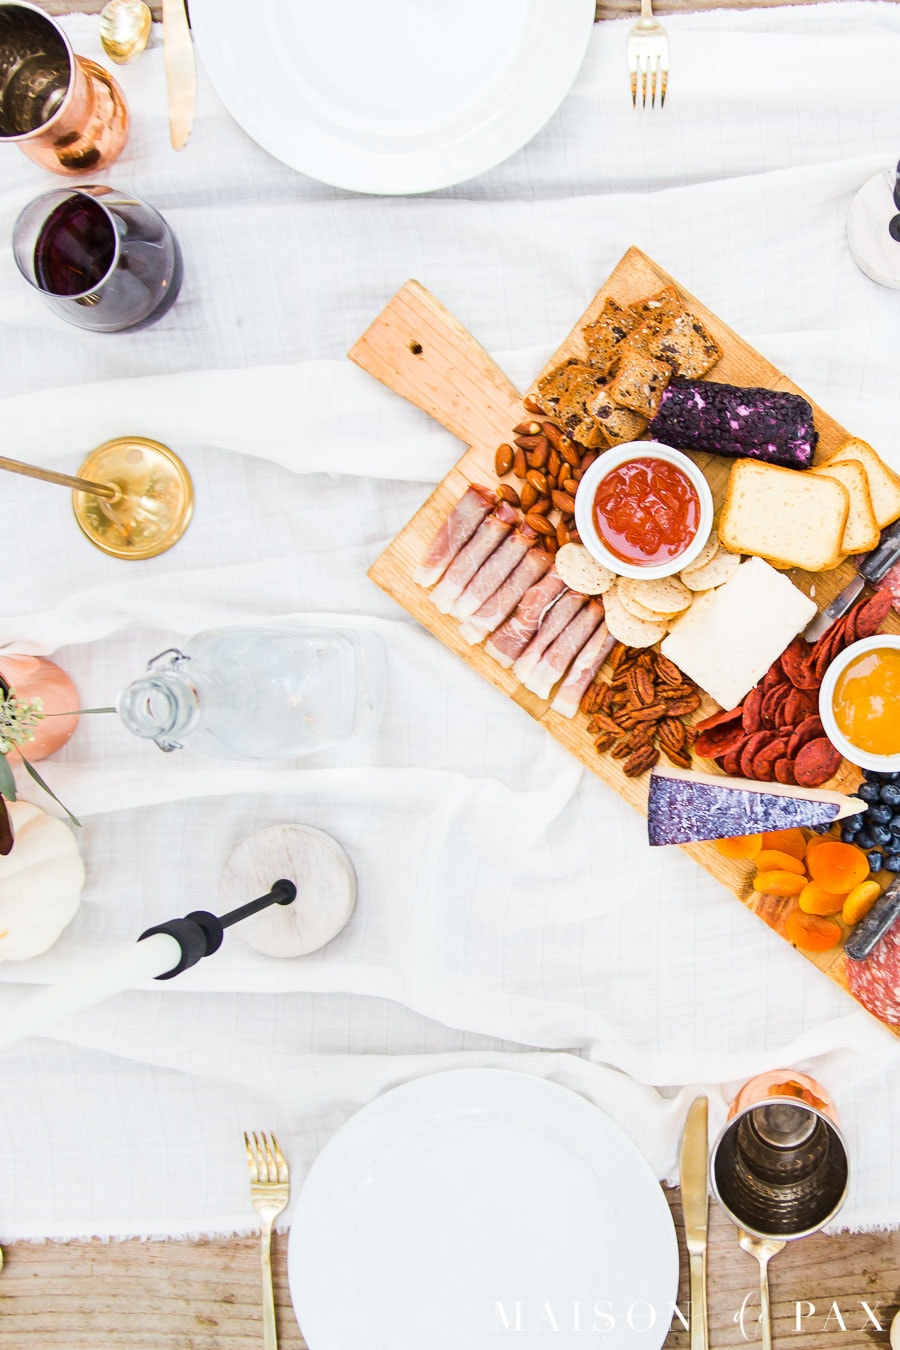 outdoor dining ideas charcuterie board candlesticks